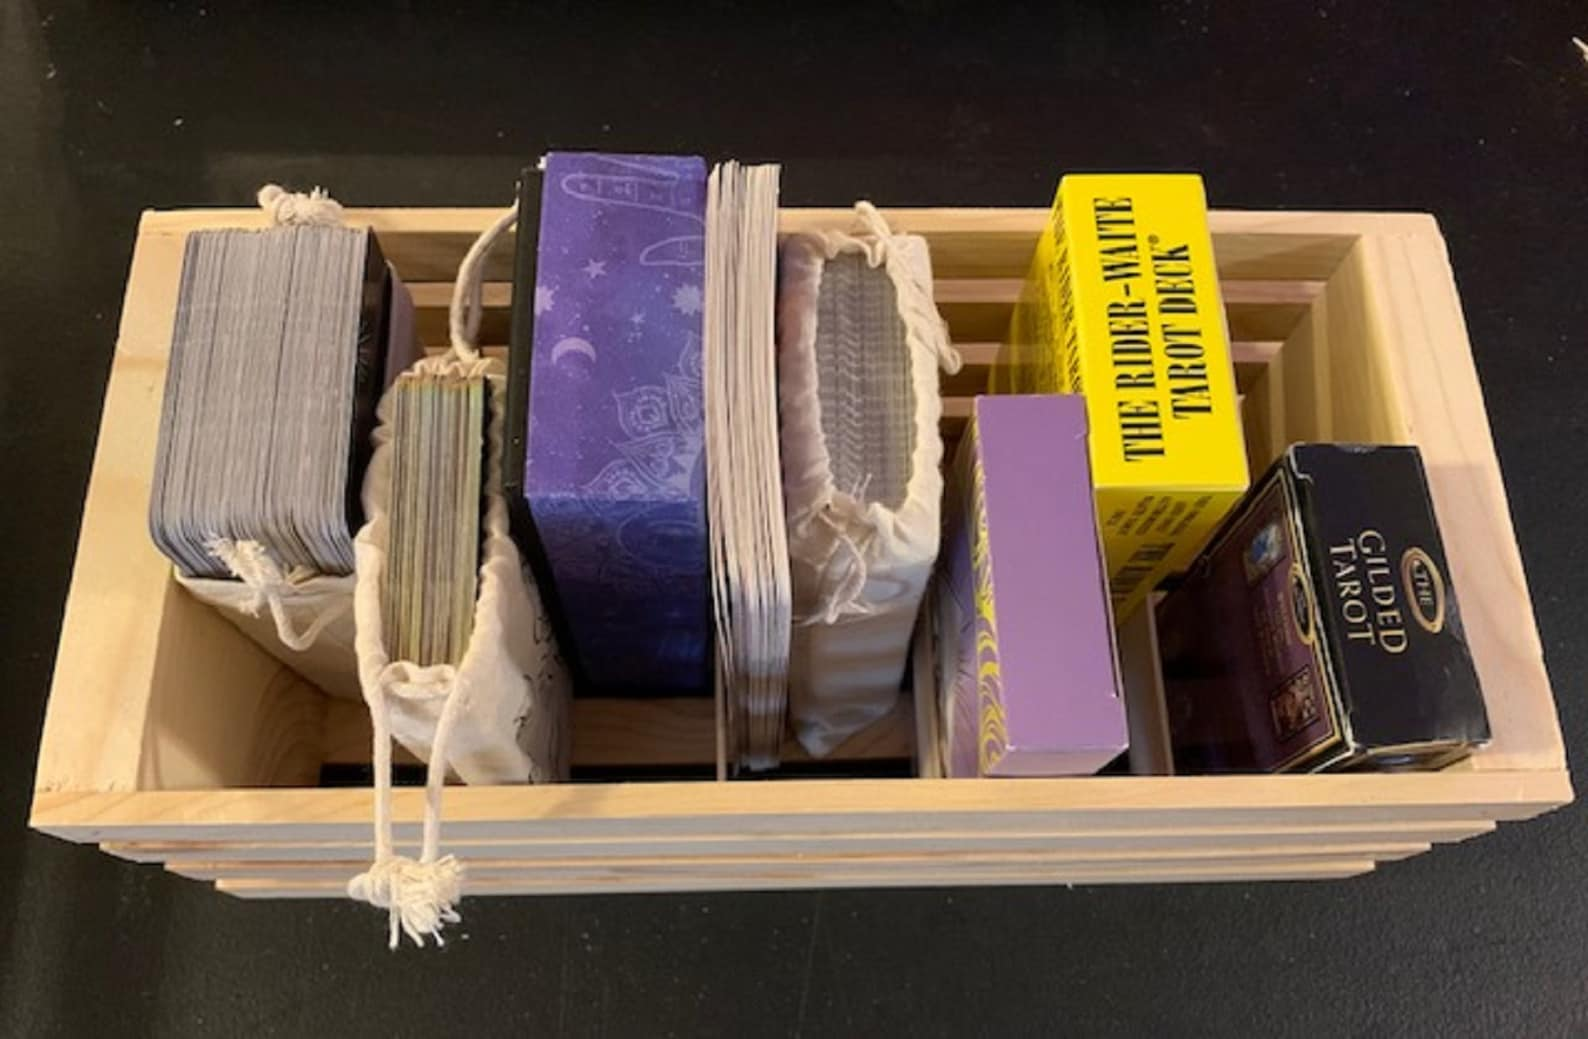 Oracle and Tarot Card deck organiser